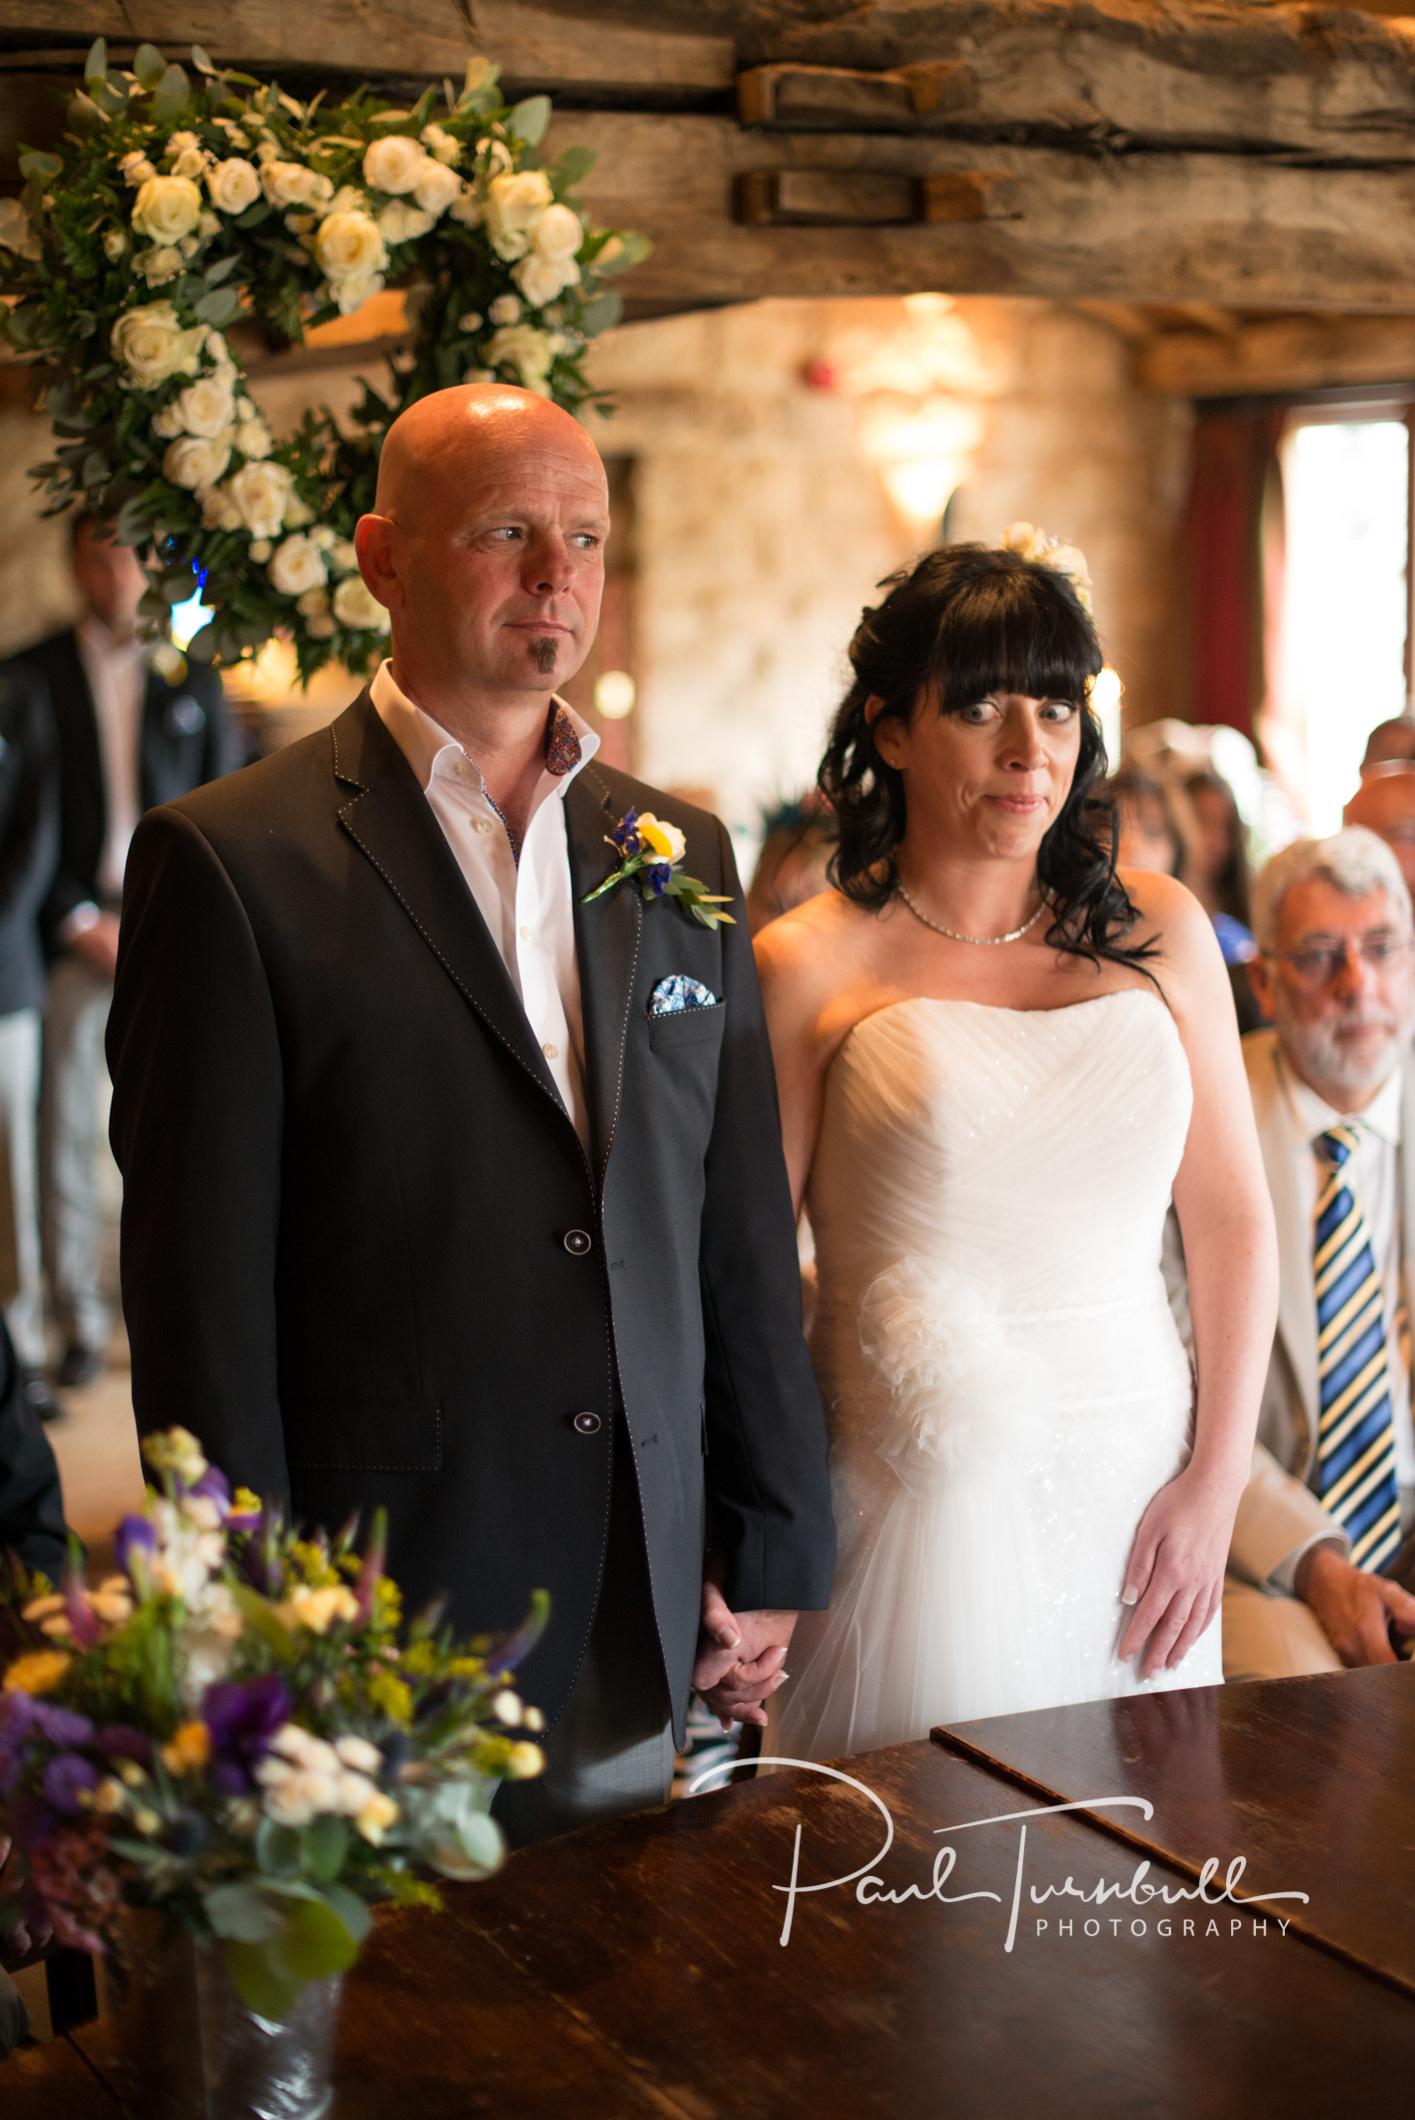 wedding-photography-star-inn-harome-yorkshire-013.jpg